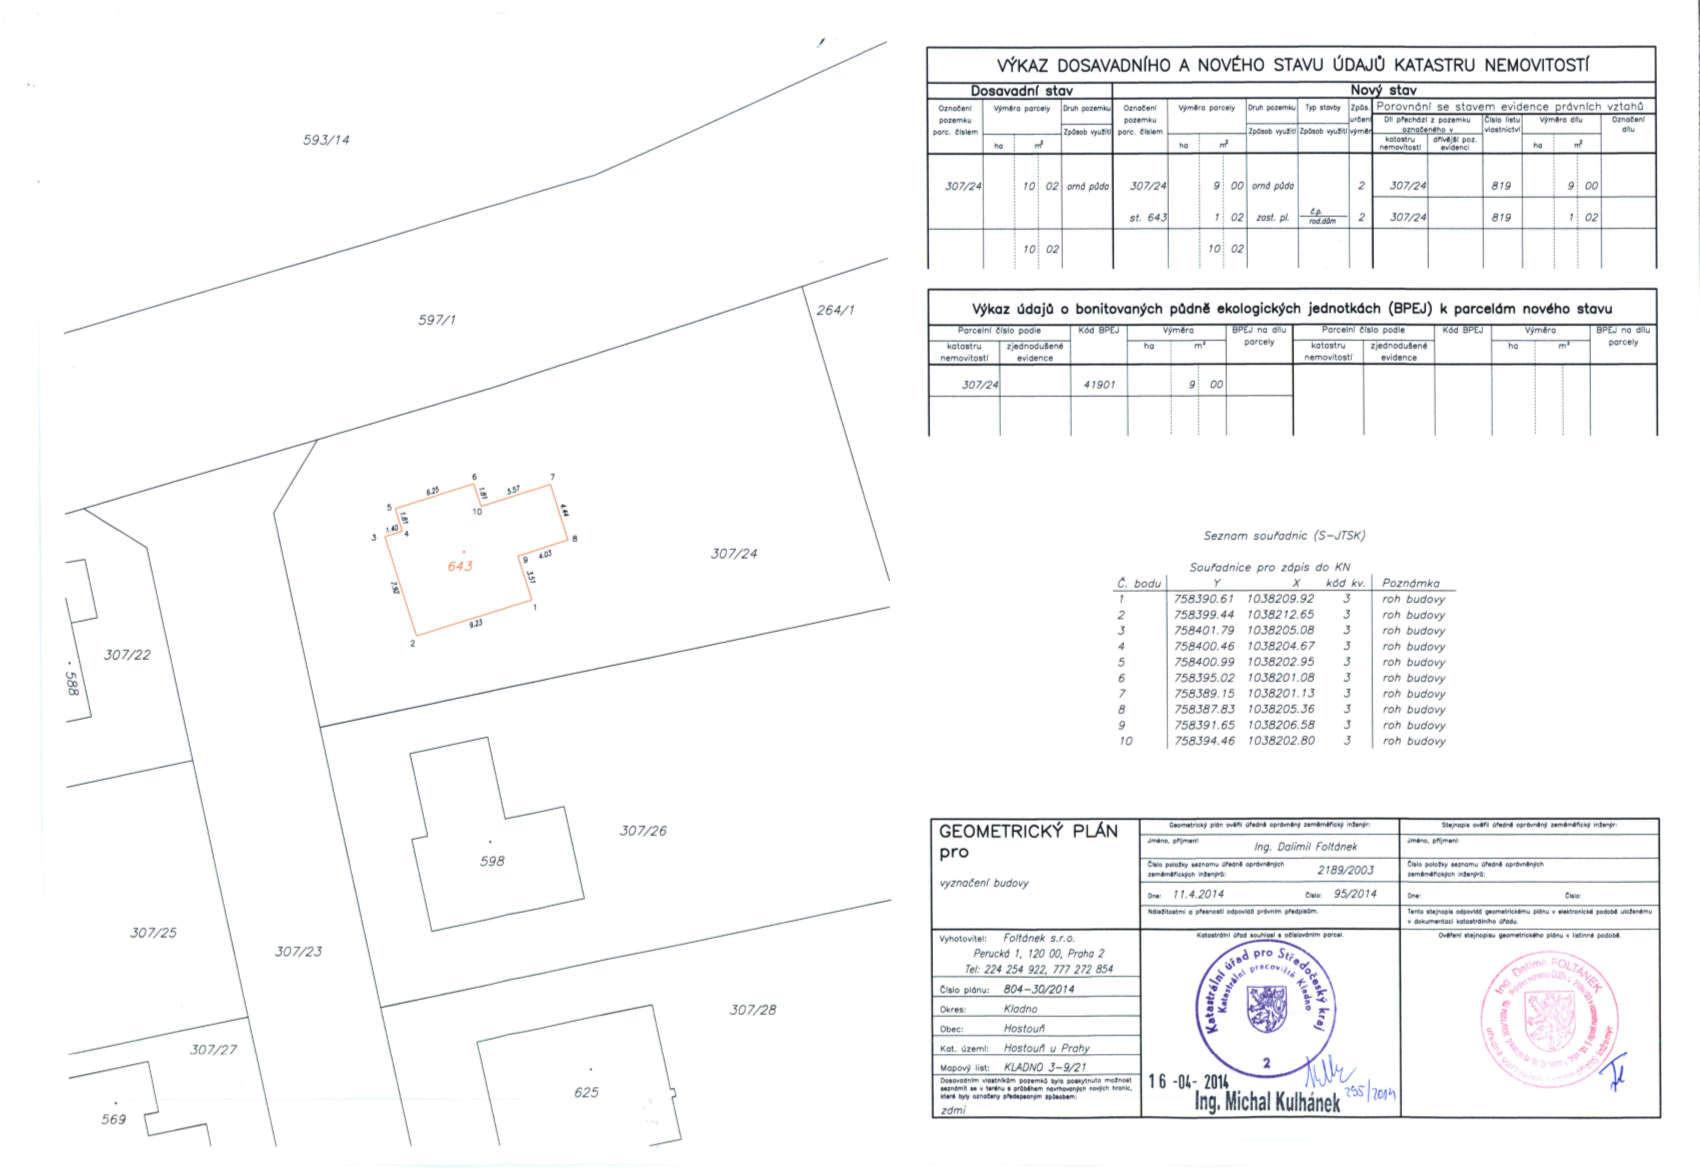 Geometricky Plan Katastr Nemovitosti Geodeticka Kancelar Foltanek